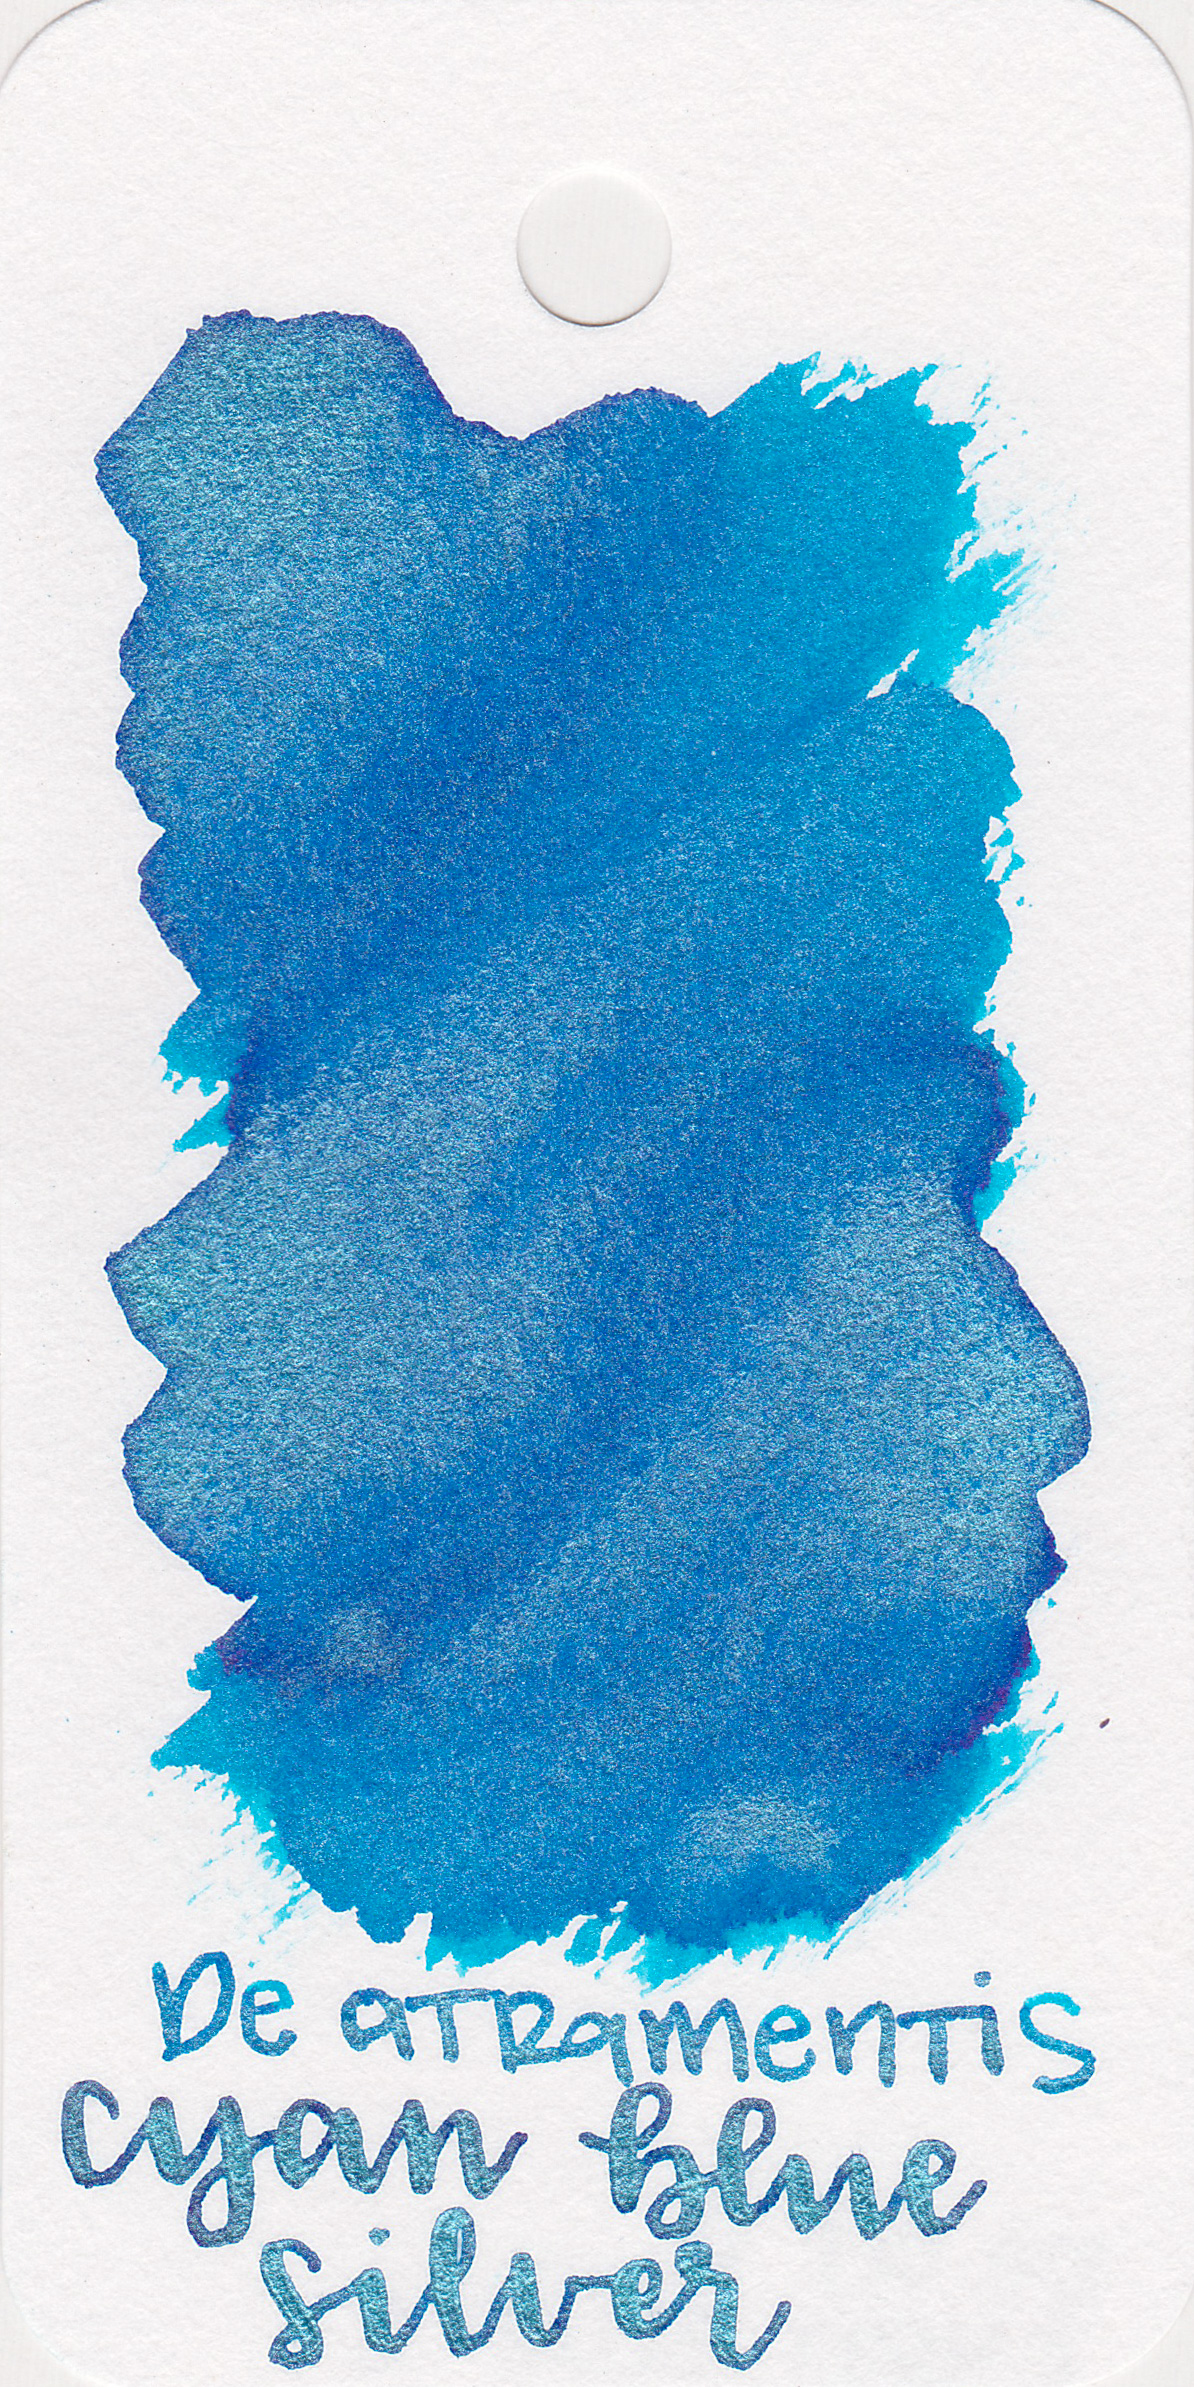 da-cyan-blue-2.jpg